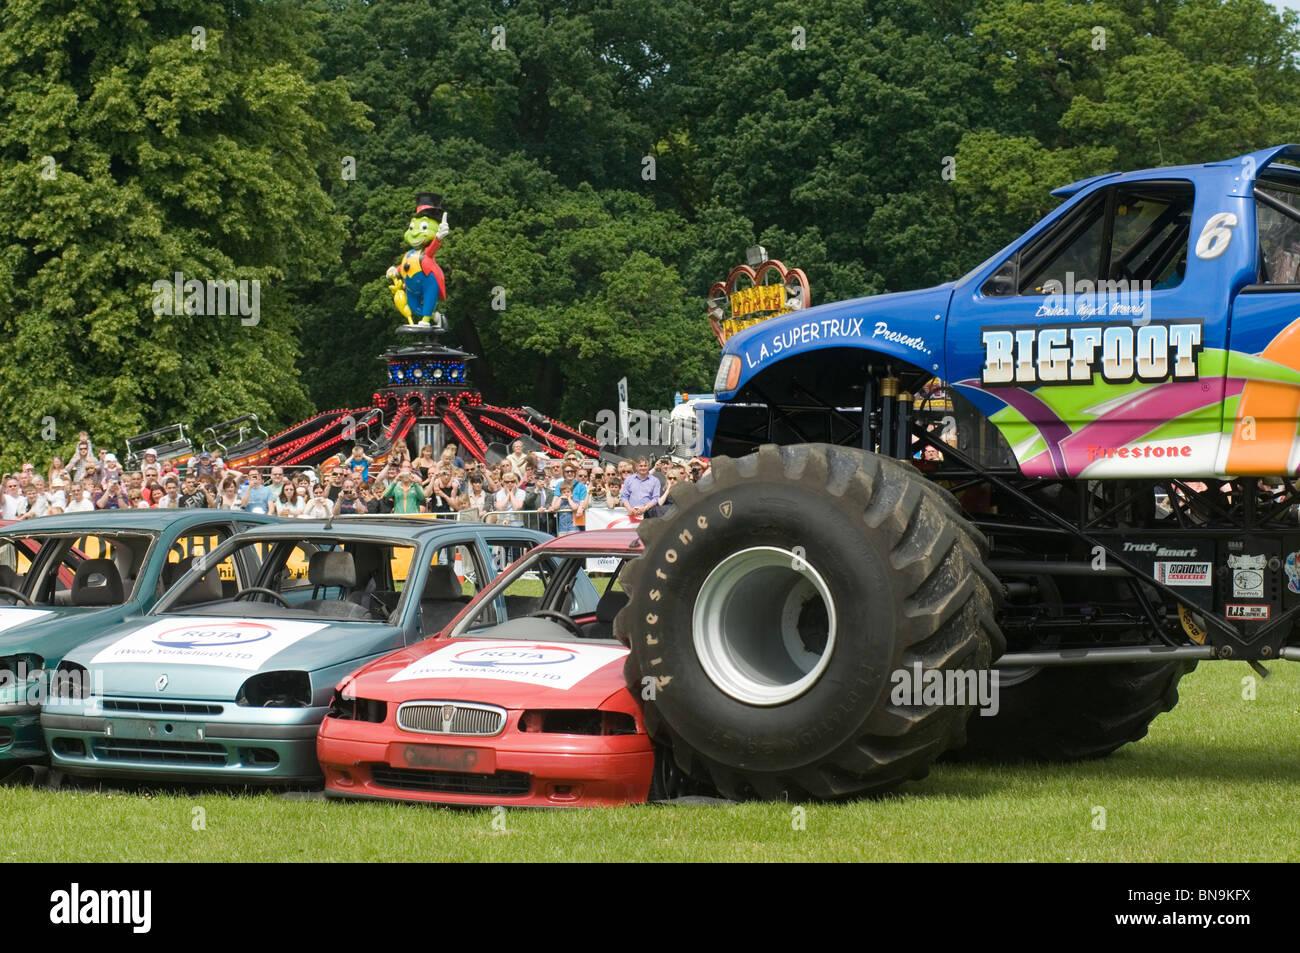 bigfoot monster truck trucks suv ford pickup pick up car crushing ...